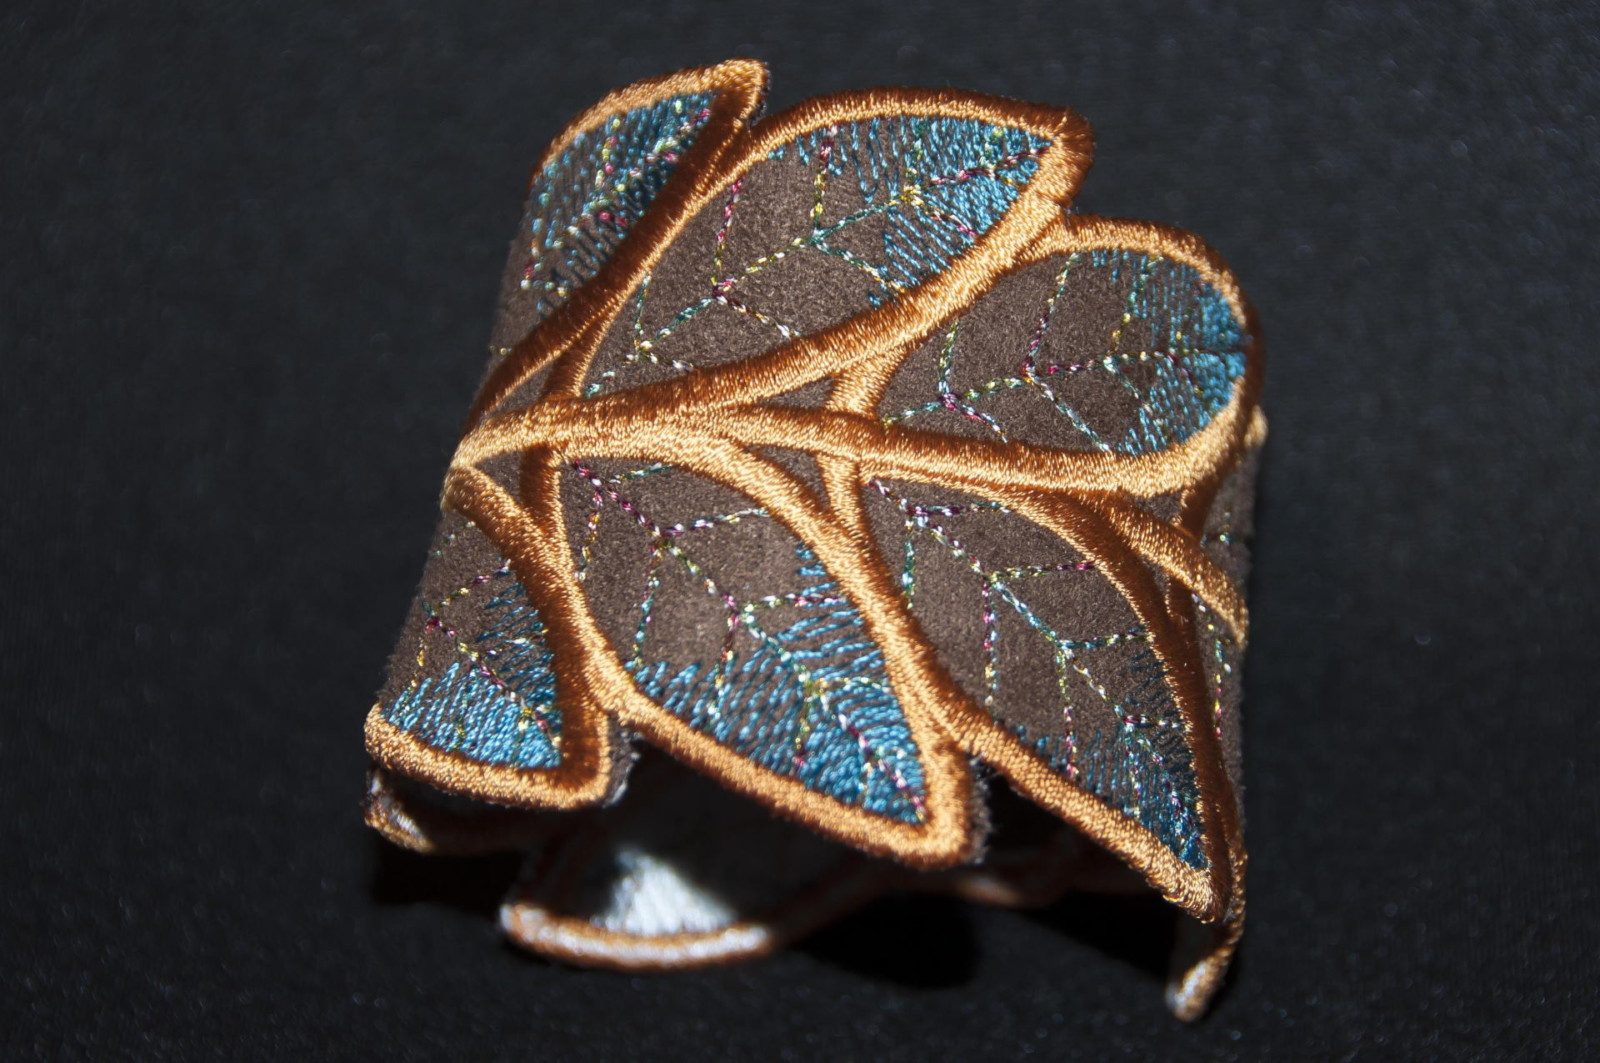 Bracelet Feuille bleu2, accessoire mode femme, mariage